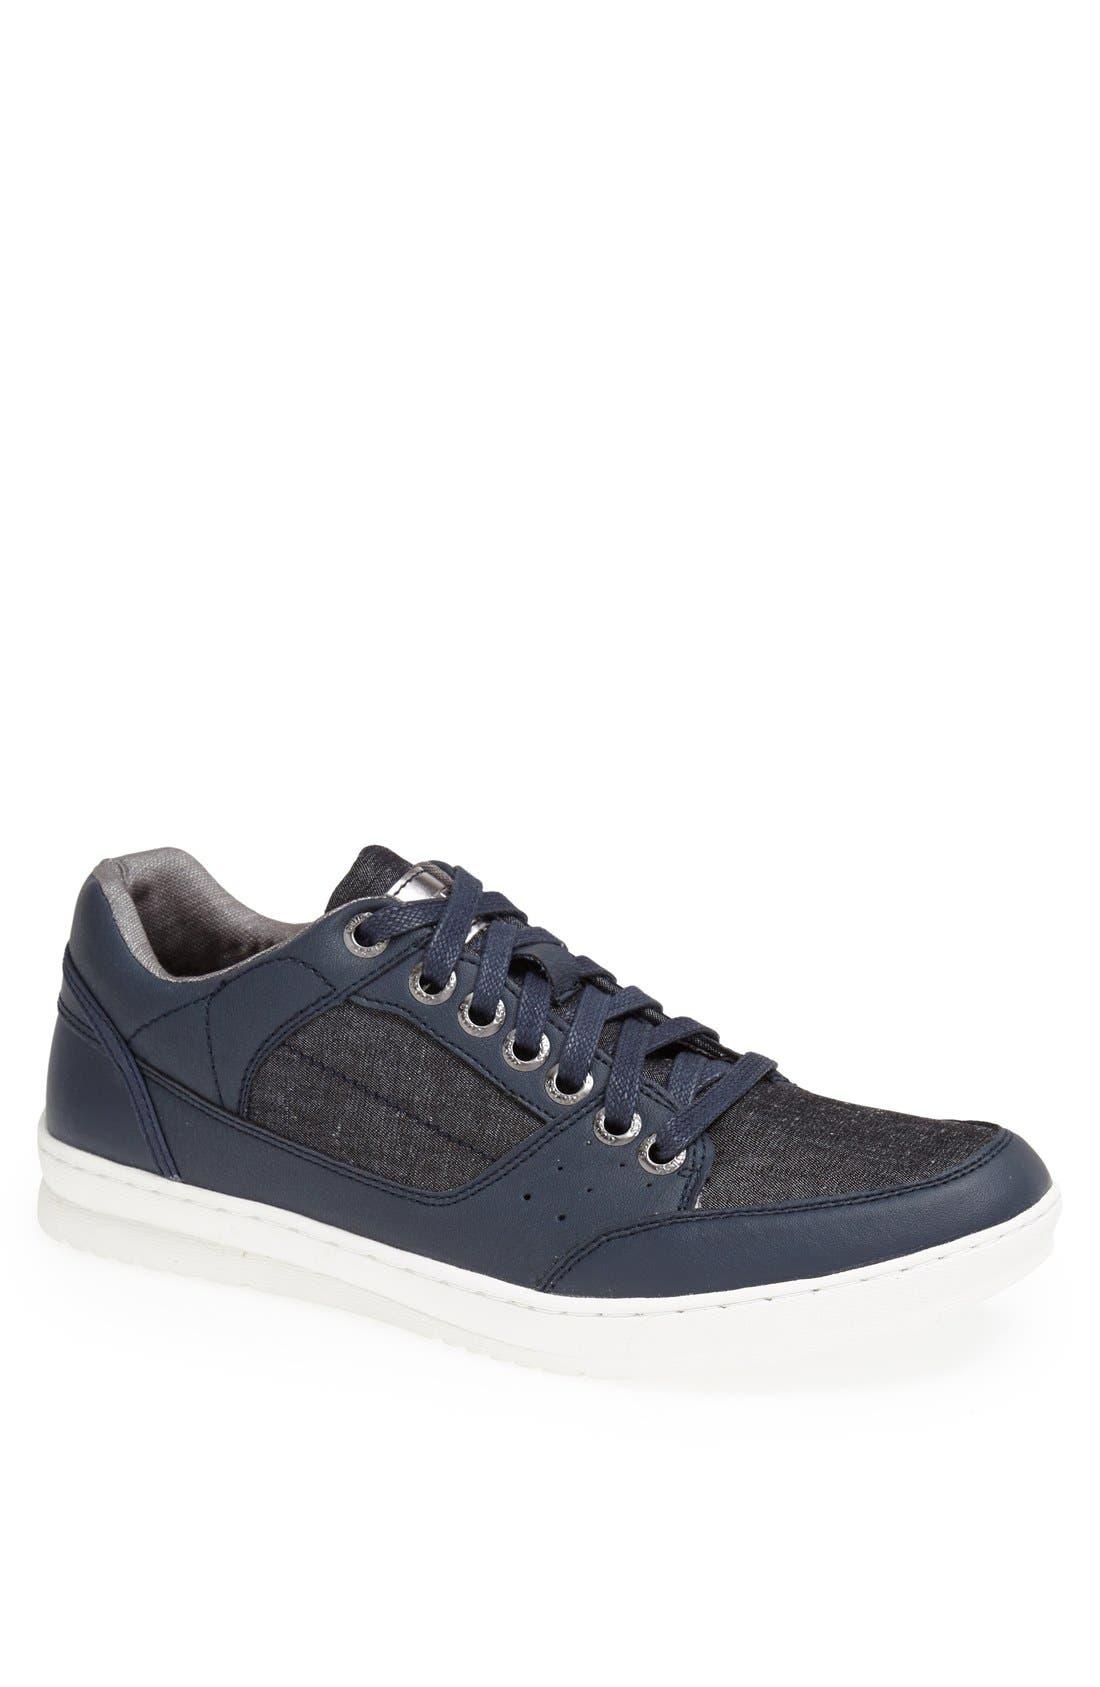 Main Image - GUESS 'Thurstan' Sneaker